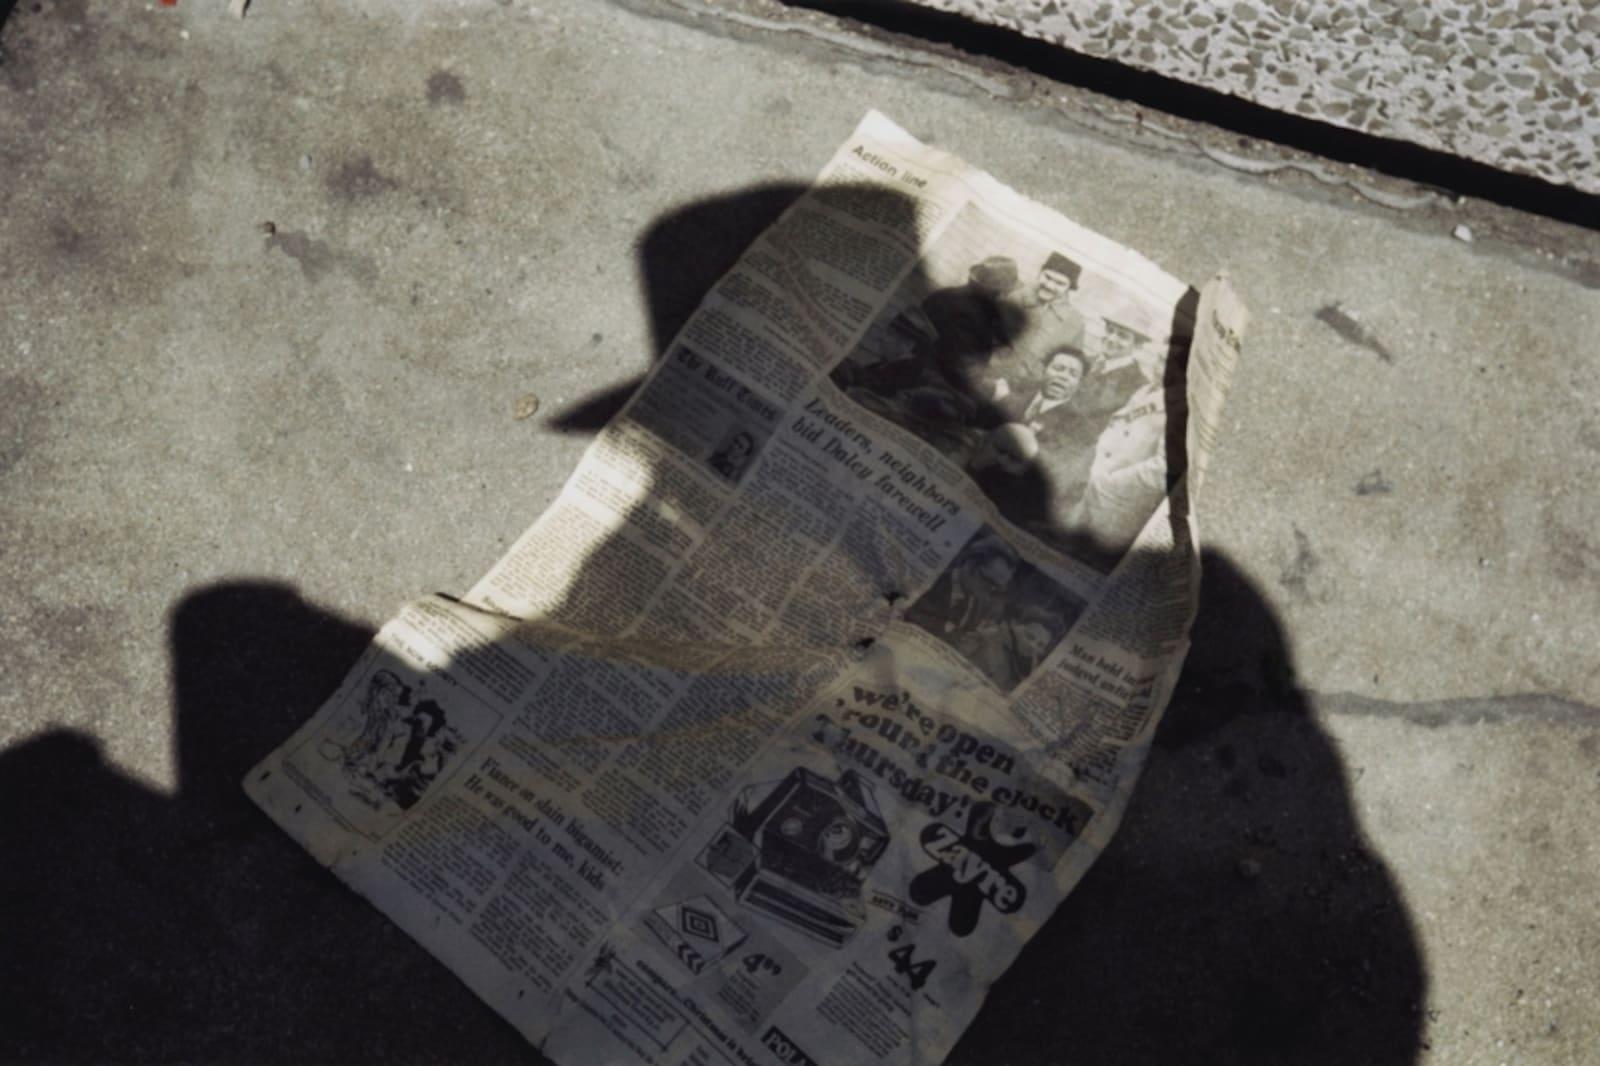 Vivian Maier, Self-portrait, Chicago area, May, 1977